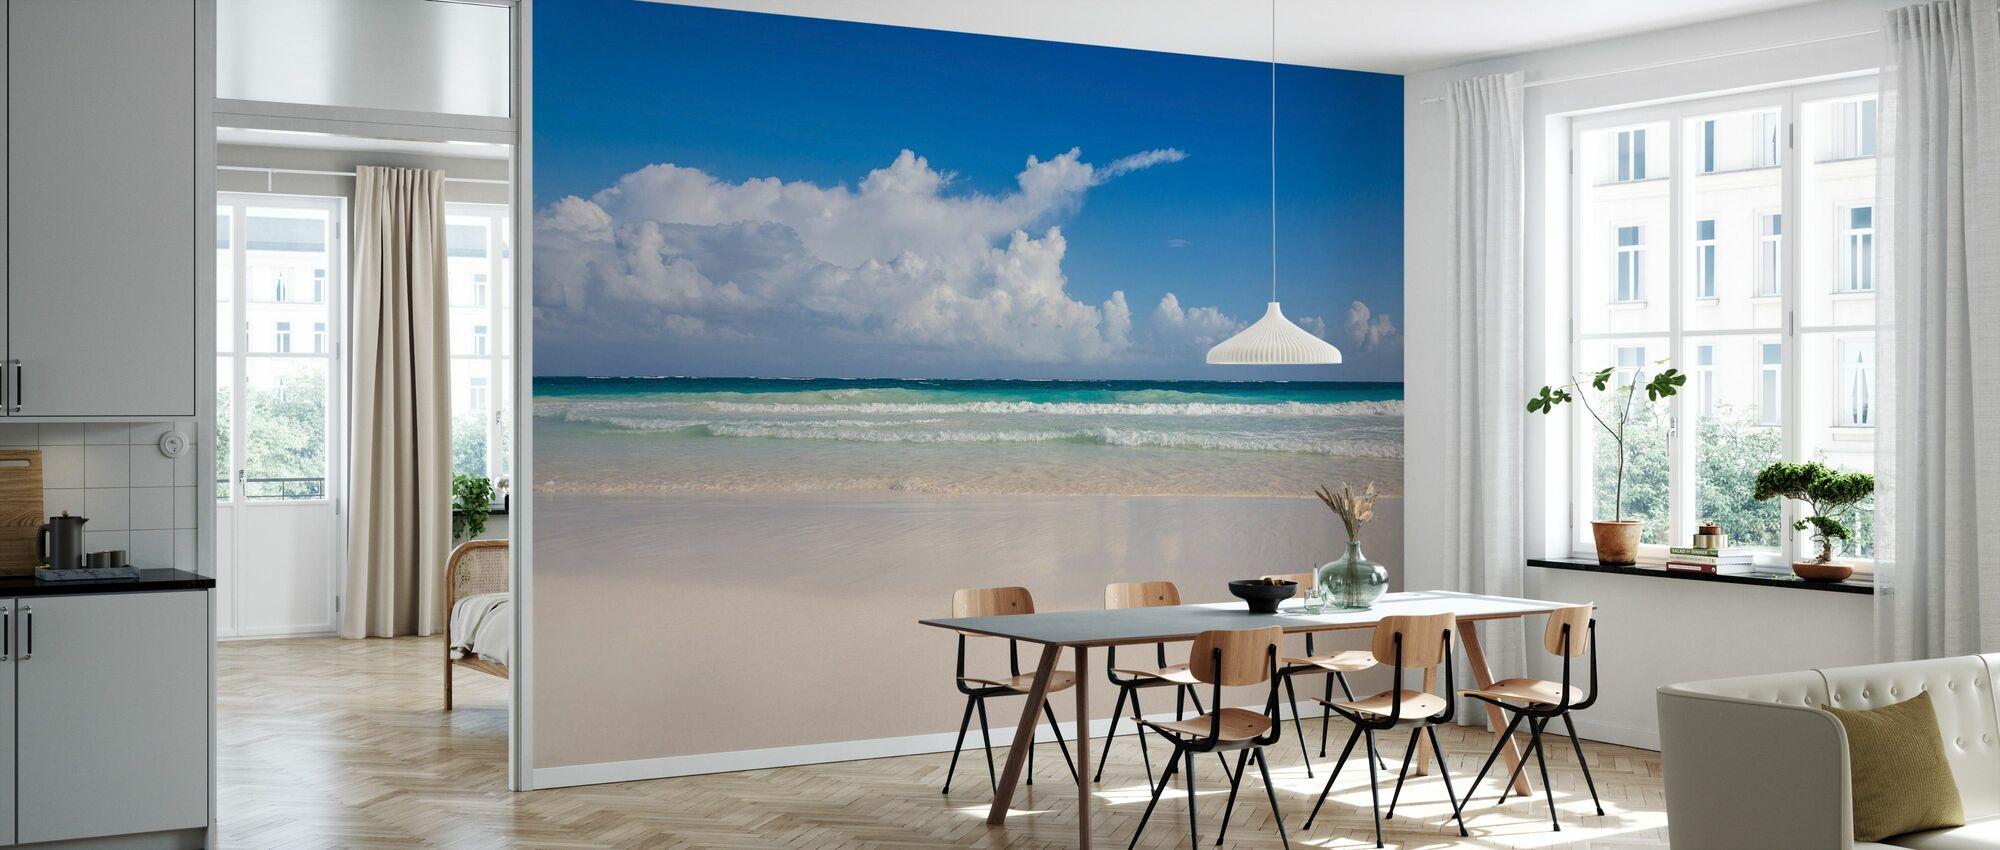 Karibian valtameri - Tapetti - Keittiö